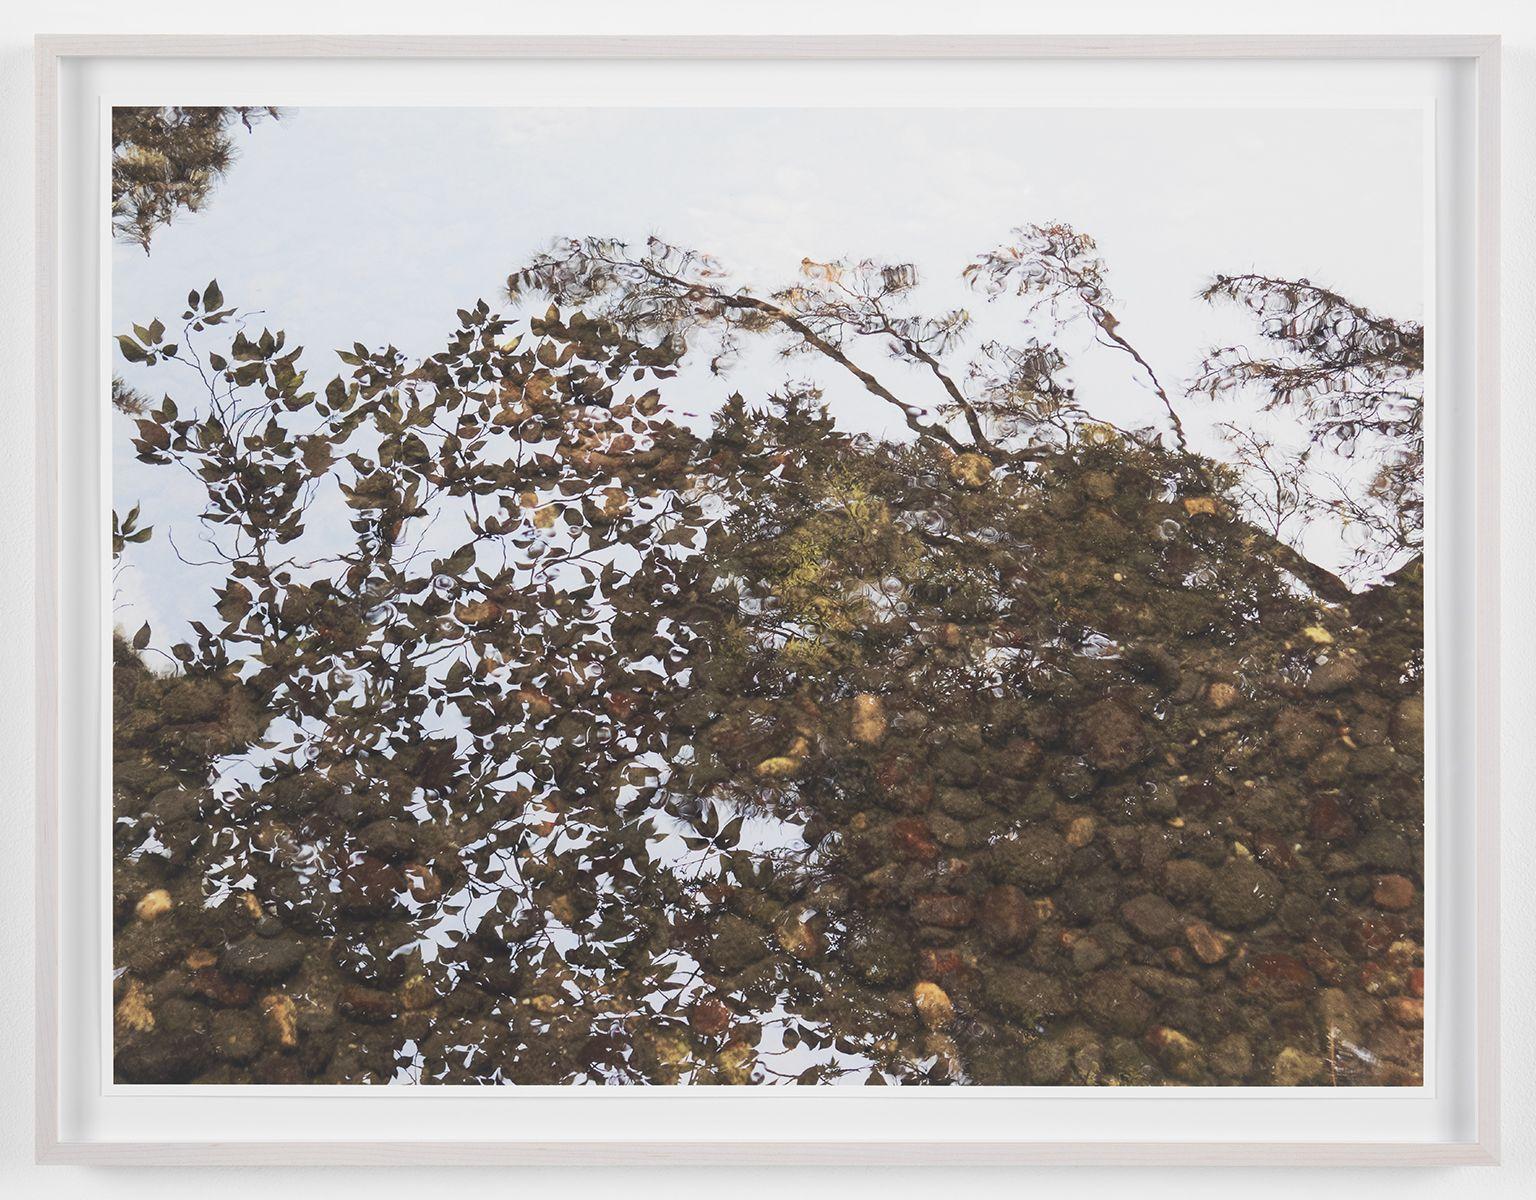 SPENCER FINCH Reflection Study (Kenrokuen), 2017